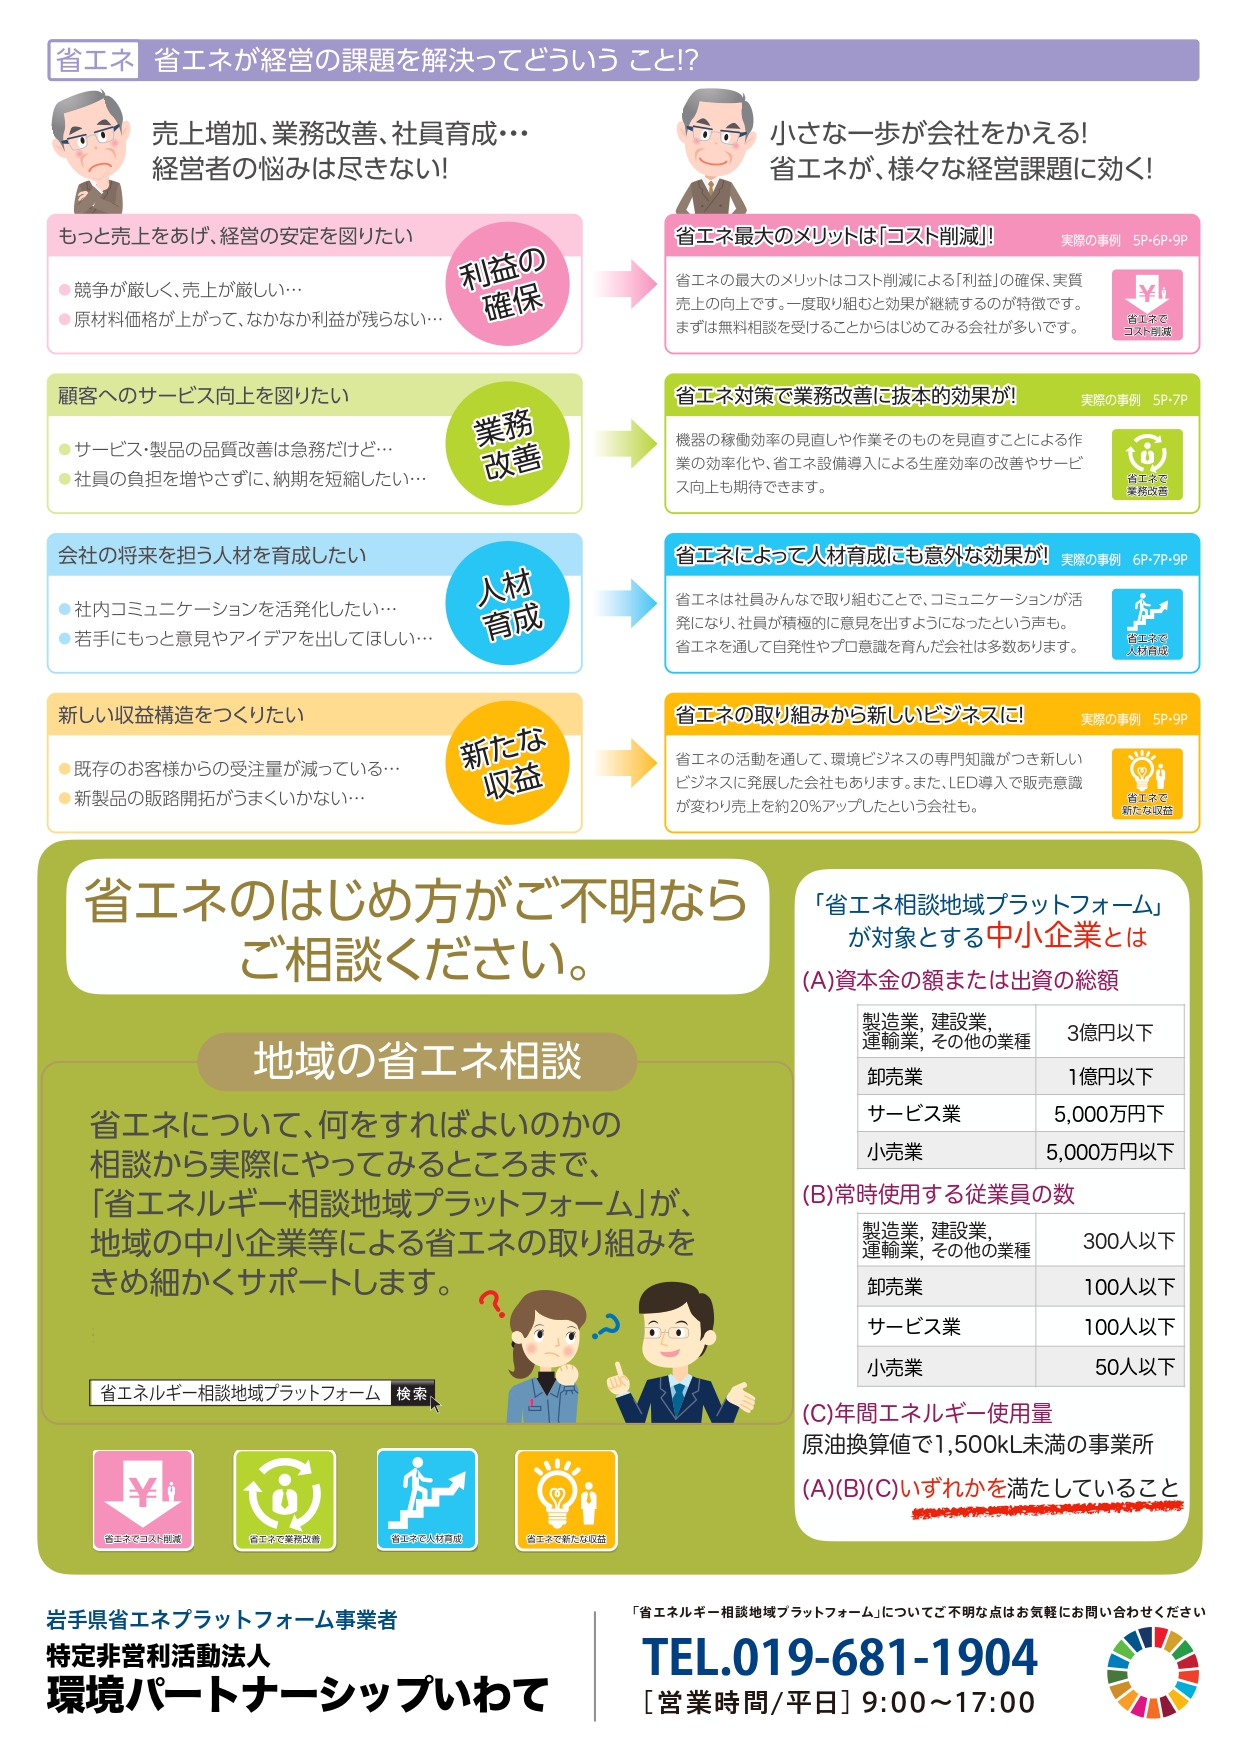 http://www.iwate-eco.jp/pr_flyer%E3%83%BB%EF%BD%A52020_page-0002.jpg